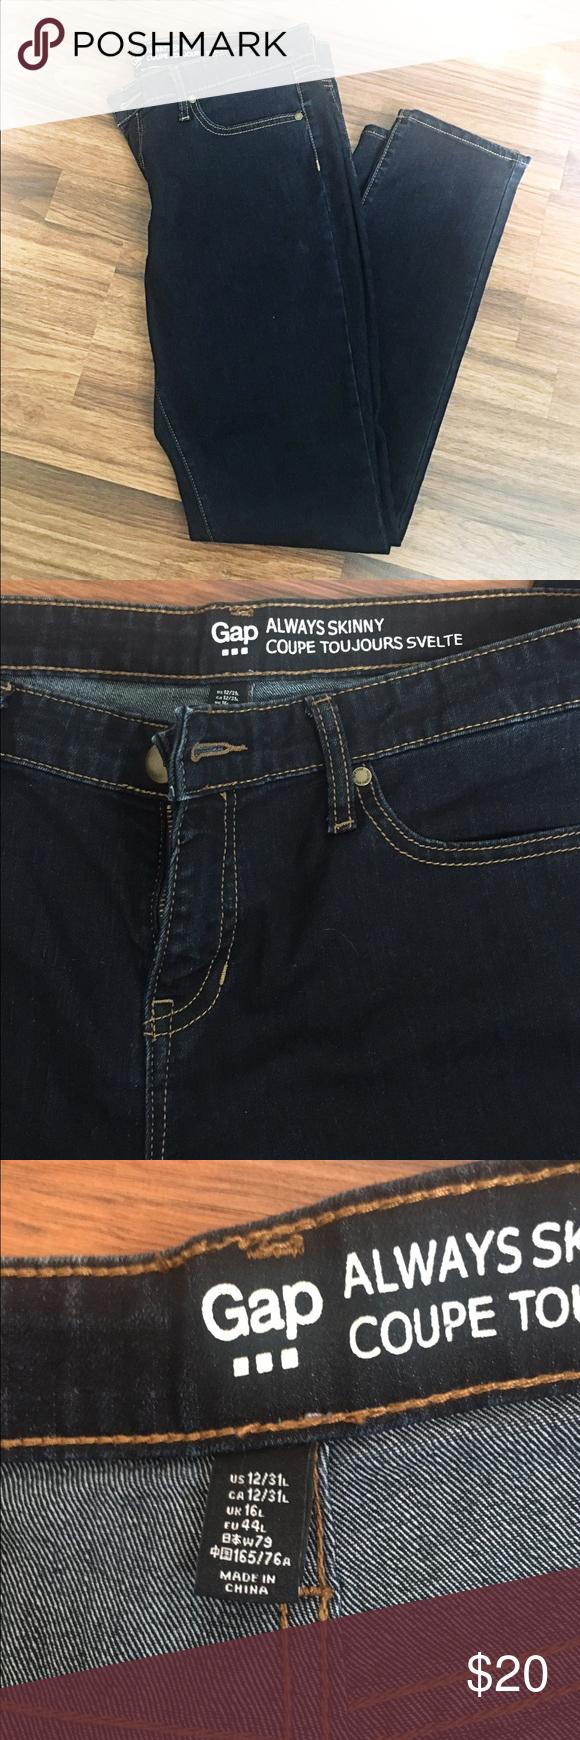 Gap always skinny jeans uk